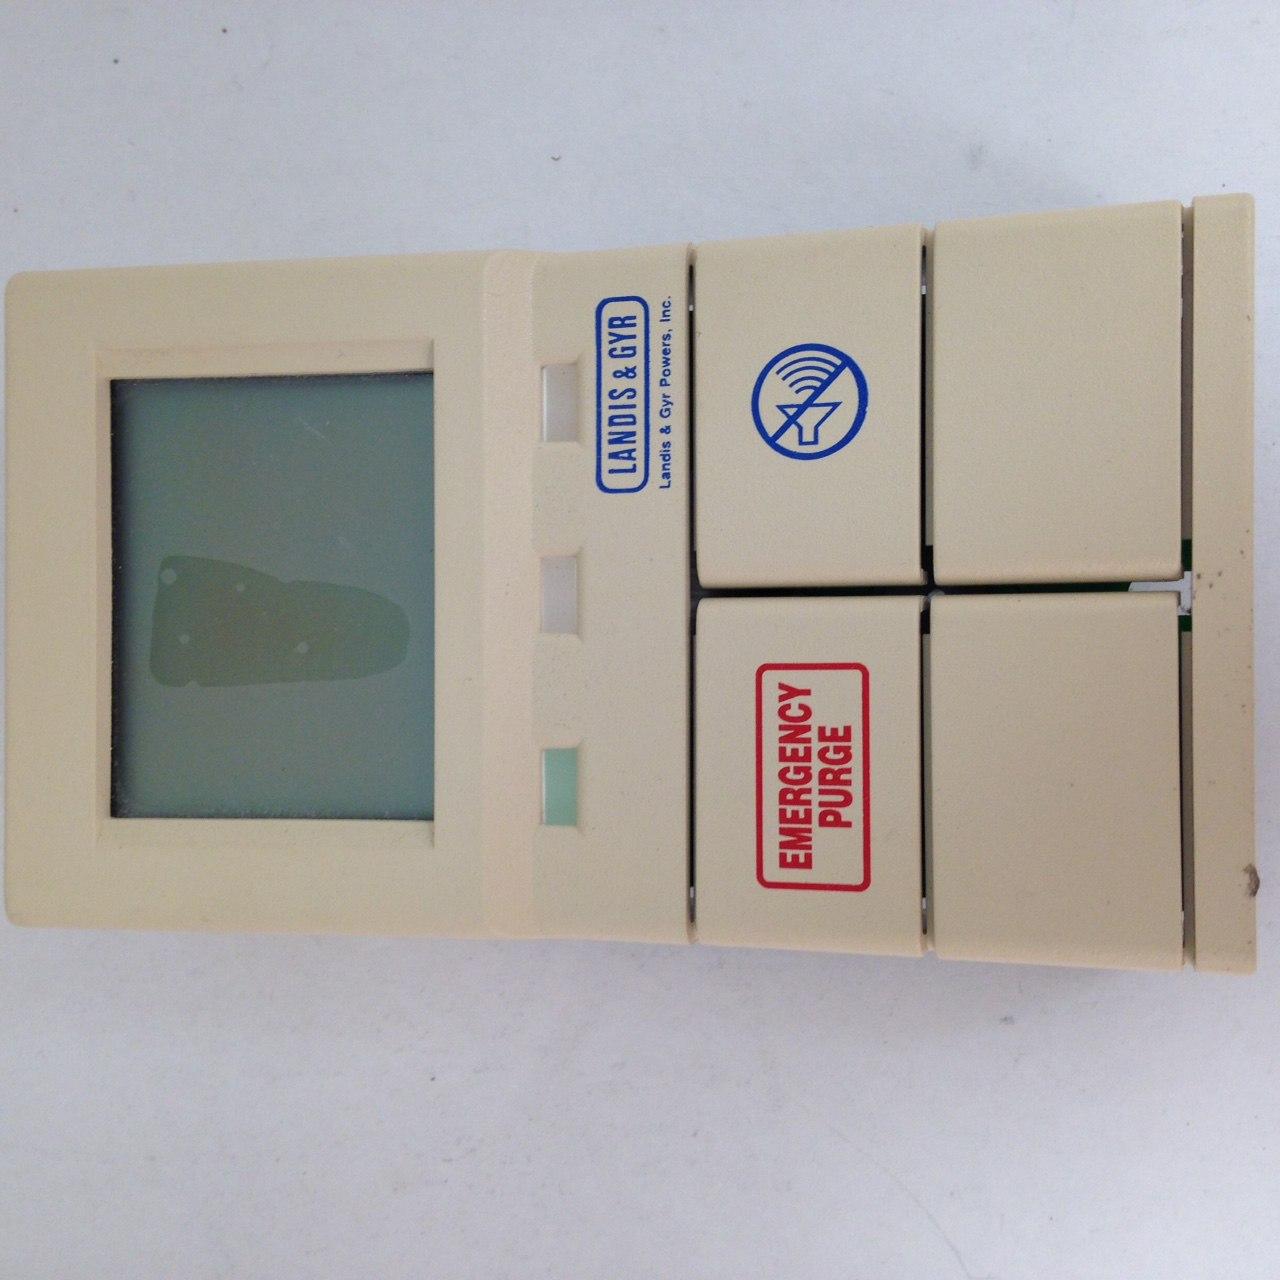 Siemens 537-720 Fume Hood Controller Operator Display Panel